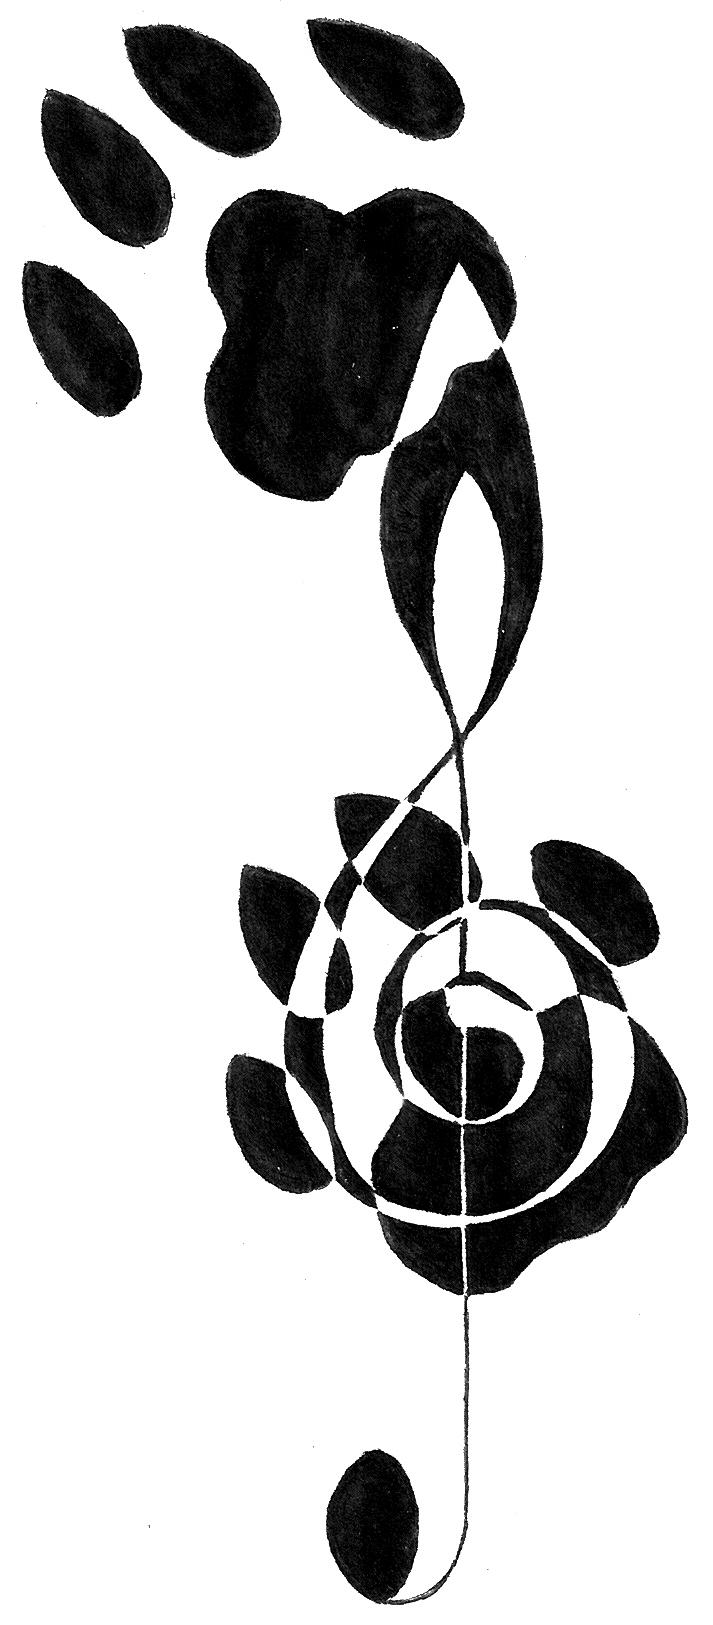 bass clef treble clef tattoo clipart best. Black Bedroom Furniture Sets. Home Design Ideas